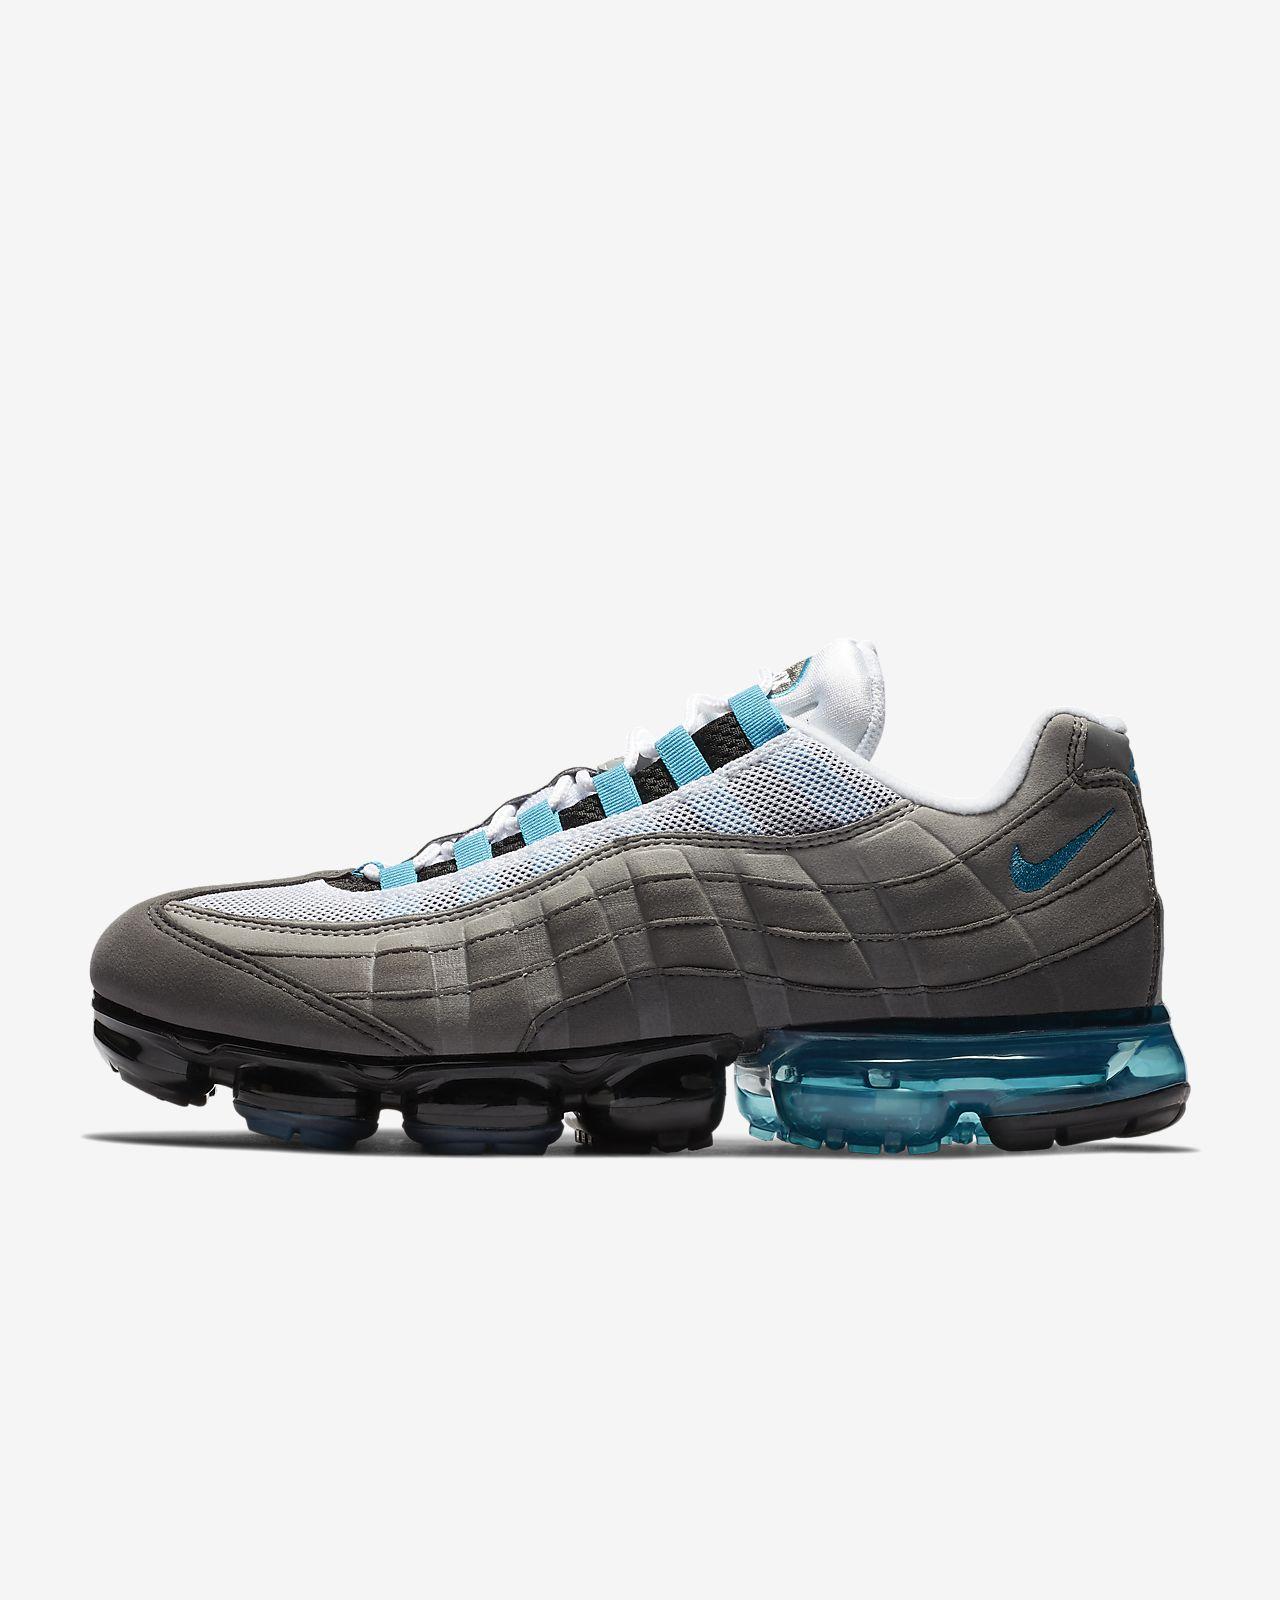 34ddaa4f1f53 Nike Air VaporMax 95 Men s Shoe. Nike.com GB